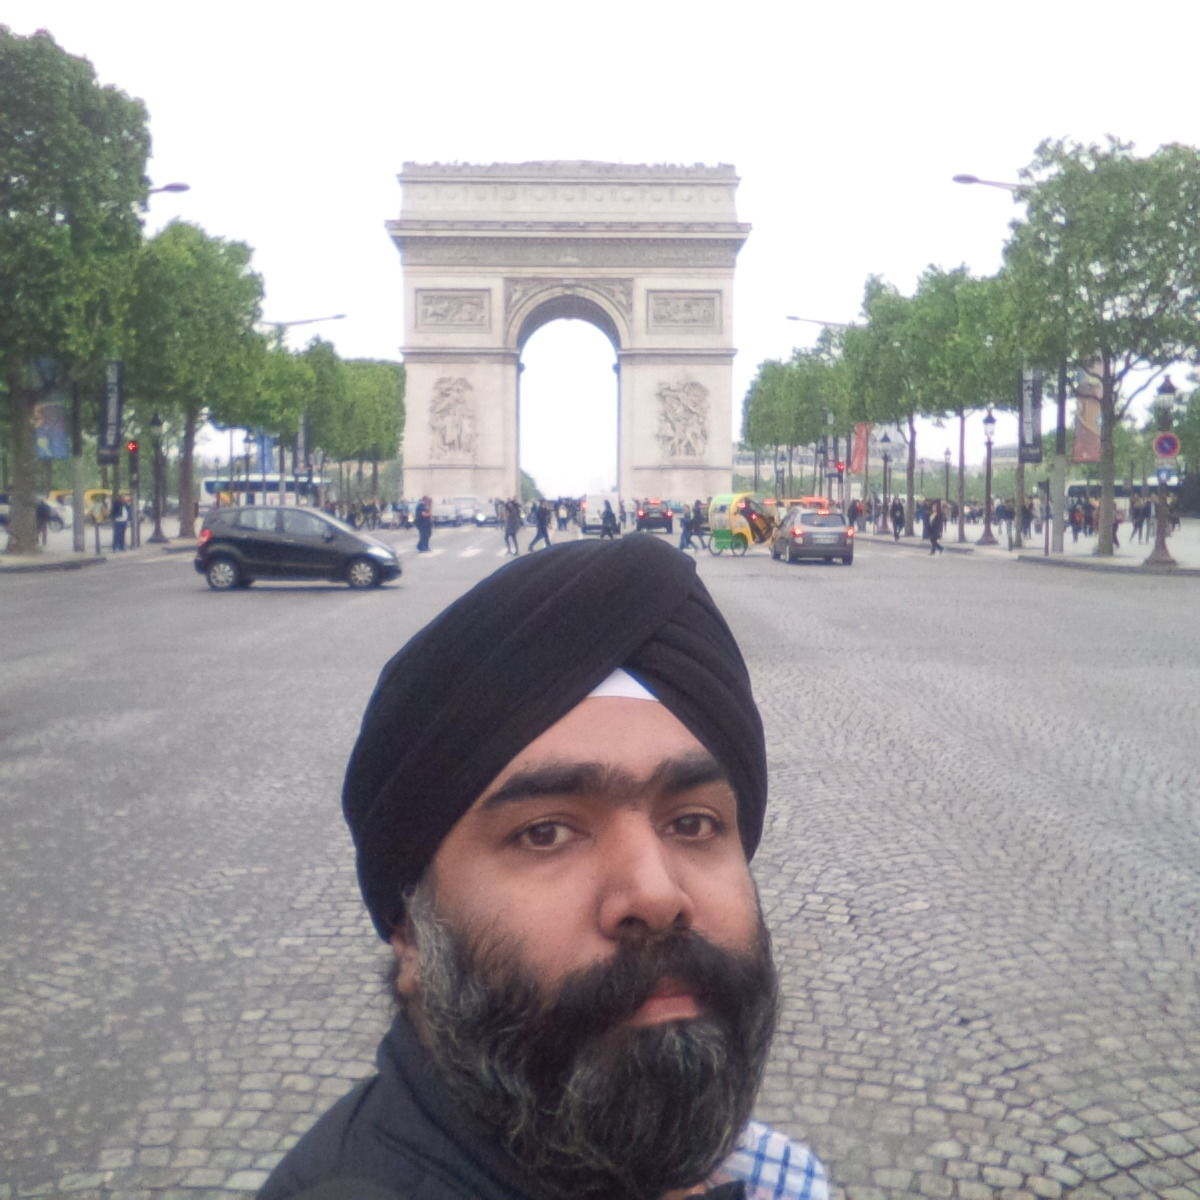 Photo of Arc de Triomphe By Charandeep Singh